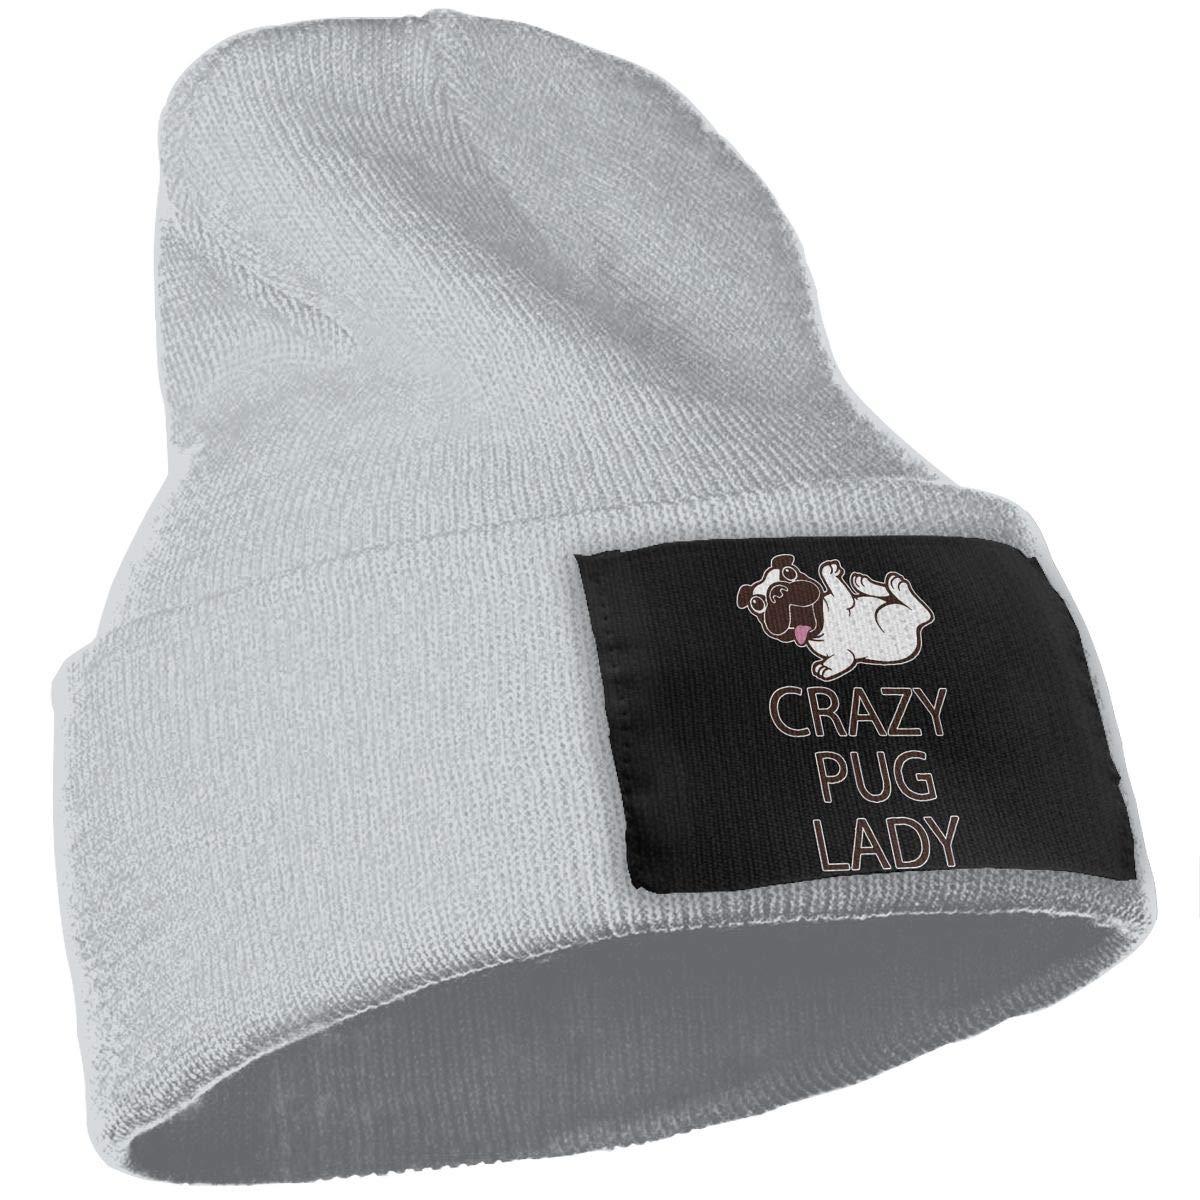 Crazy Pug Lady Fashion Ski Cap WHOO93@Y Unisex 100/% Acrylic Knitted Hat Cap